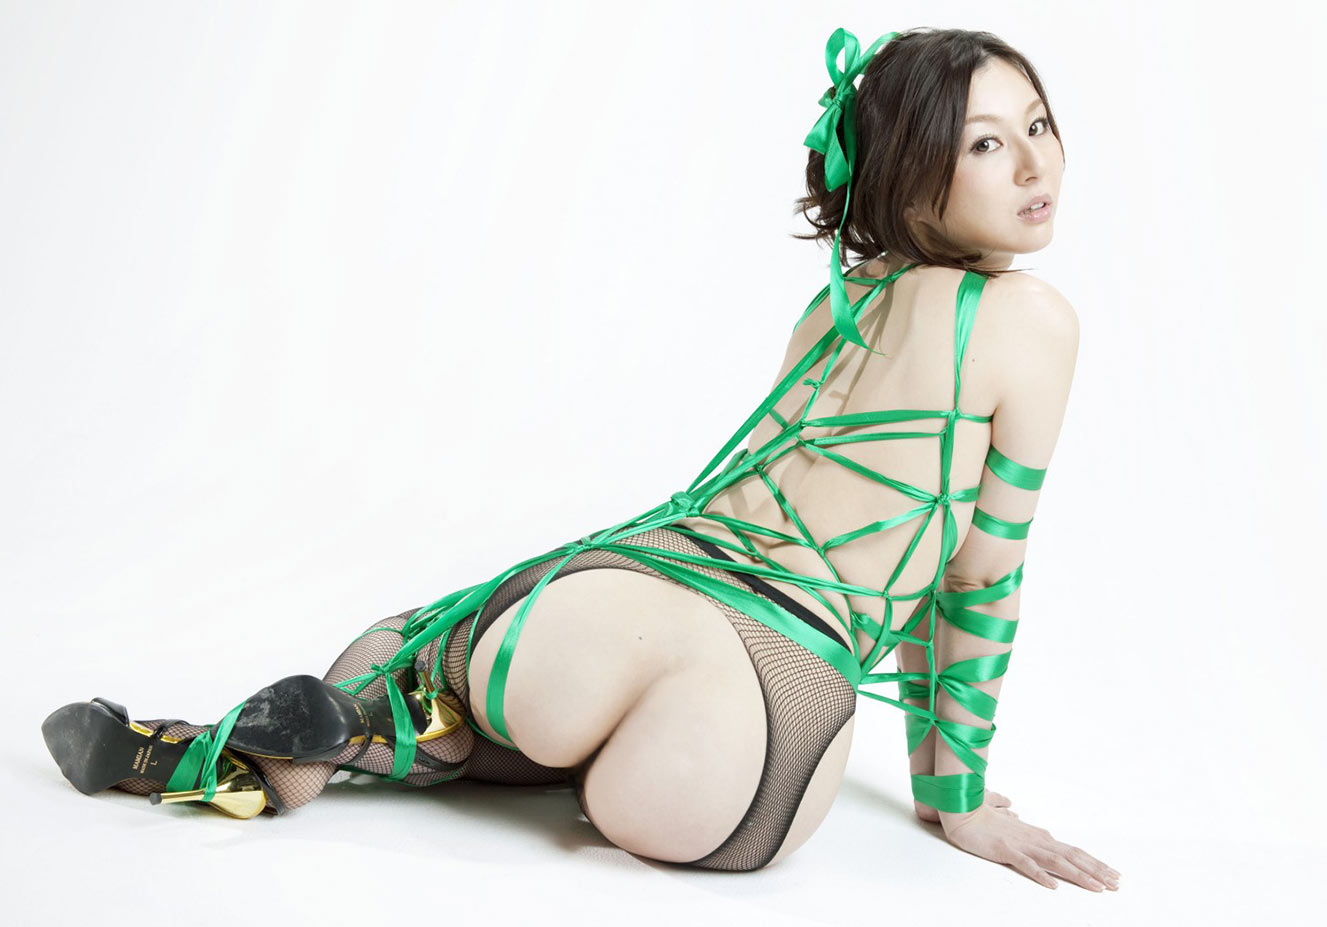 Японское искусство связывания шибари / Shibari-art - Green Label by Hajime Kinoko